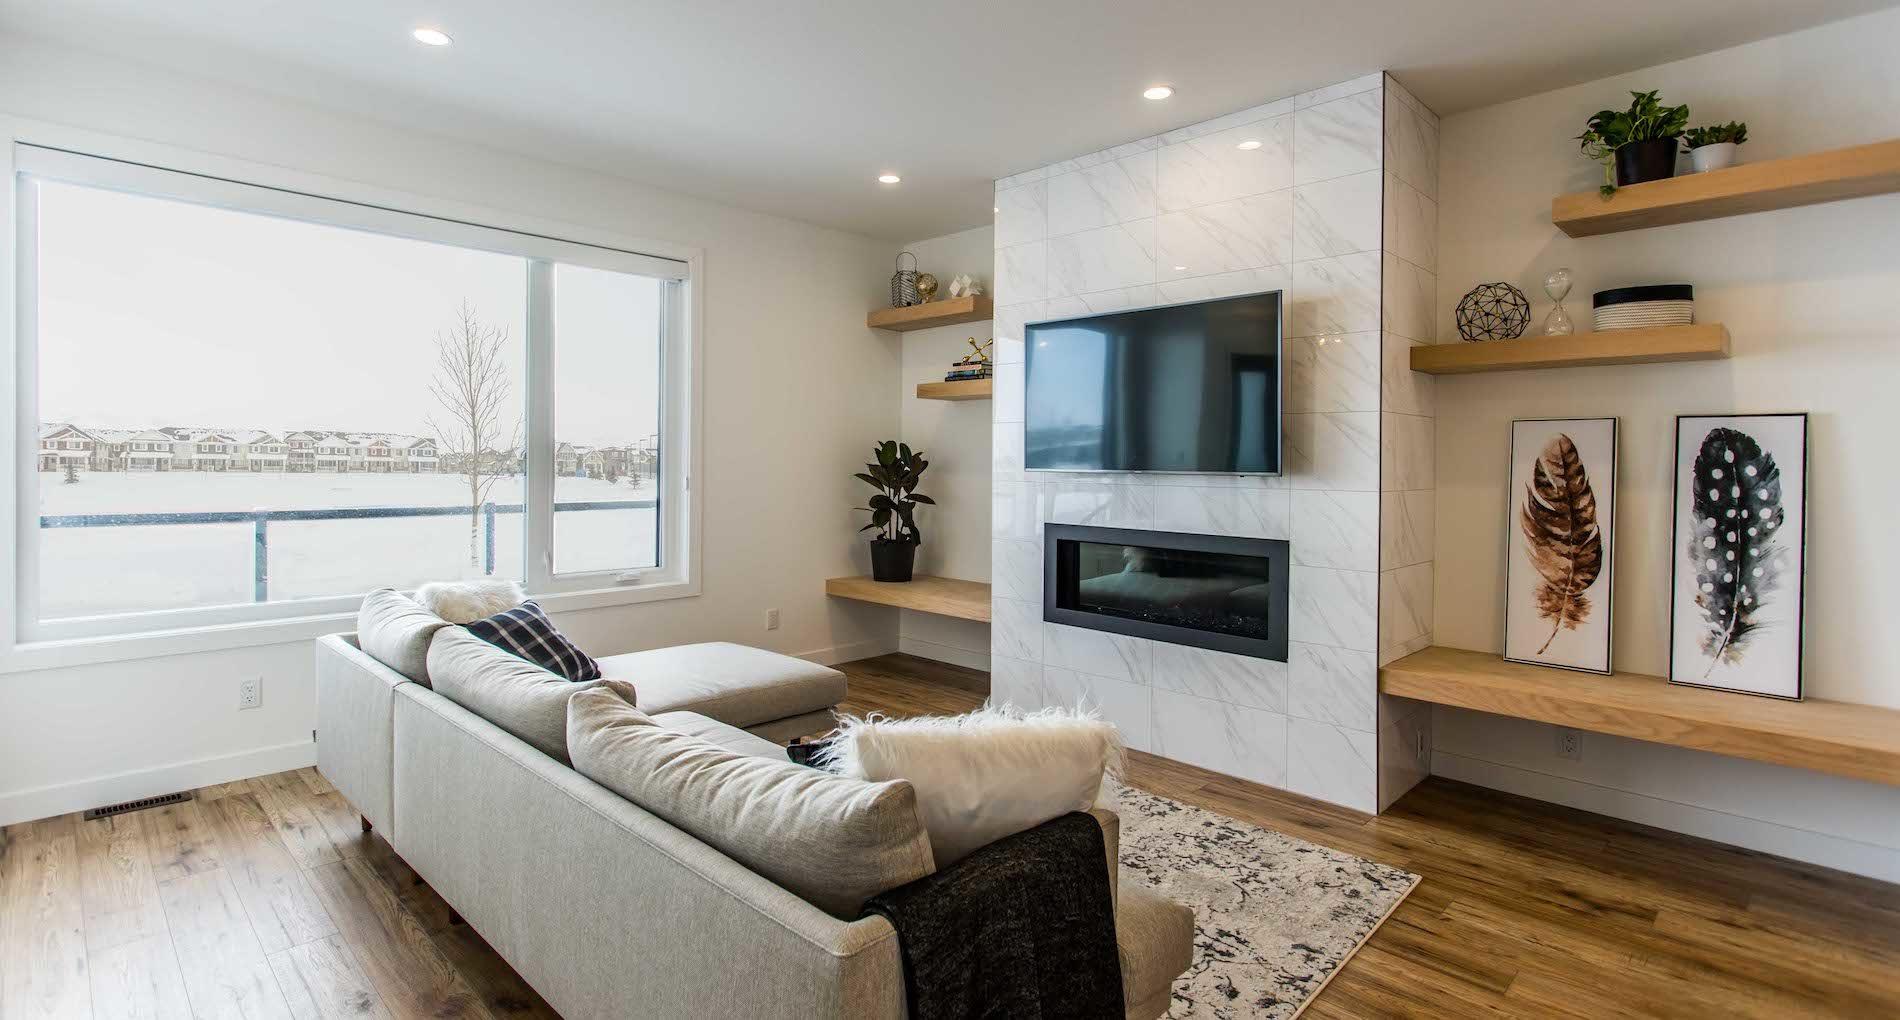 Picturesk Media Alair Homes 4426 Albulet Interiors 3